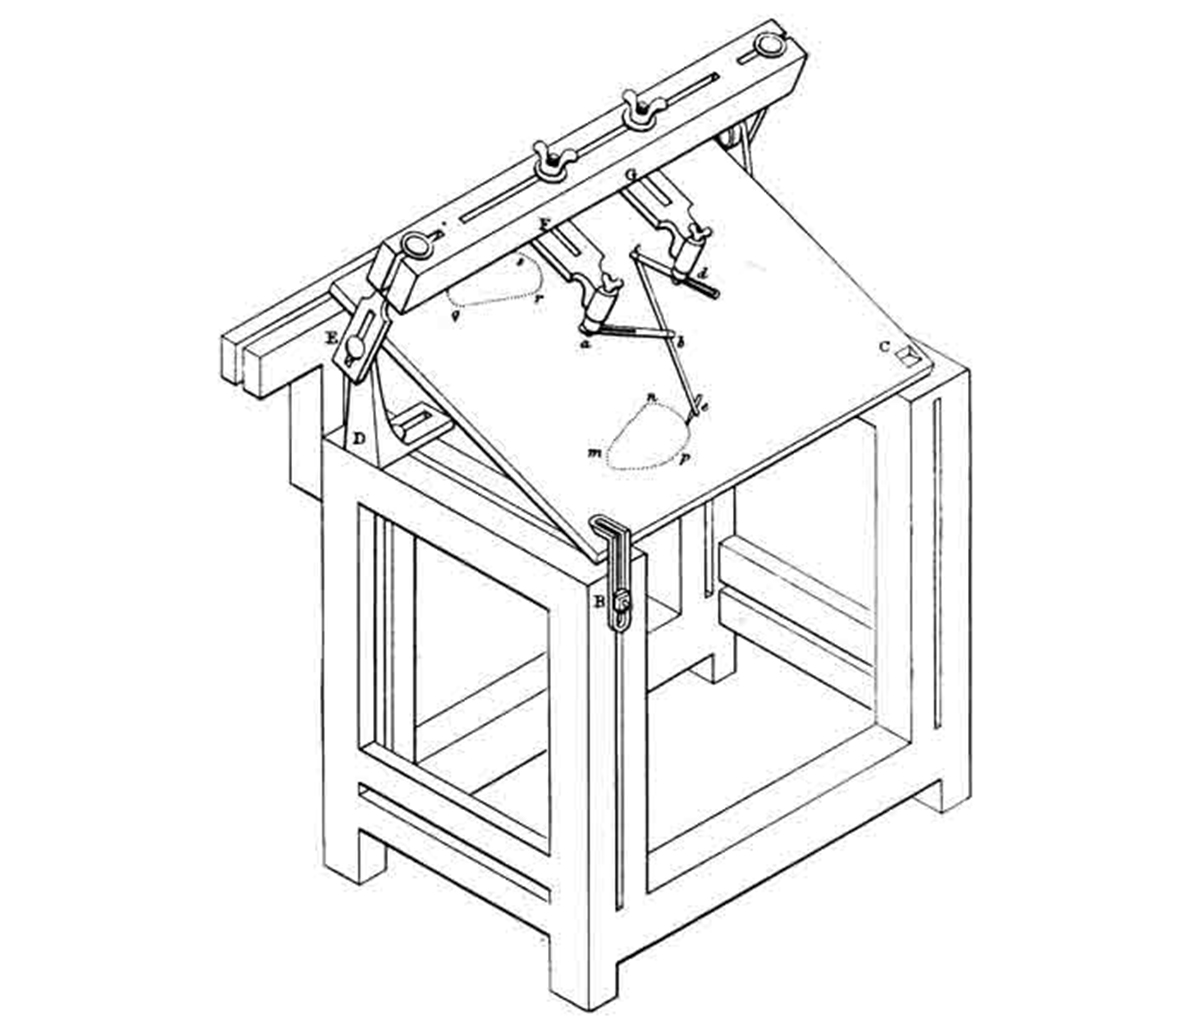 Coupler-Point Path-Generating Machine